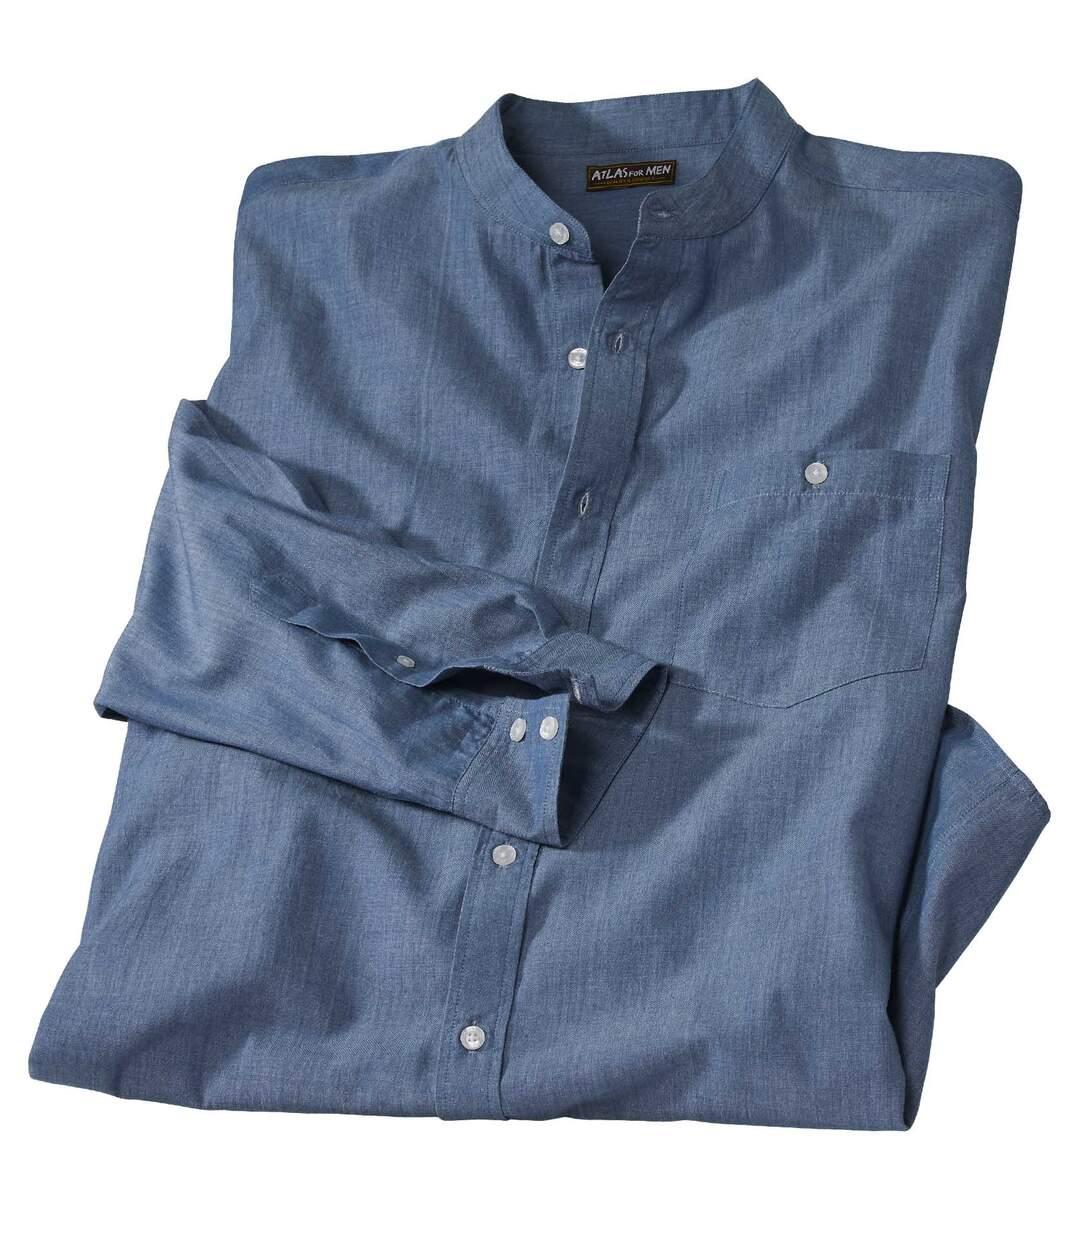 Koszula ze stójką z tkaniny chambray